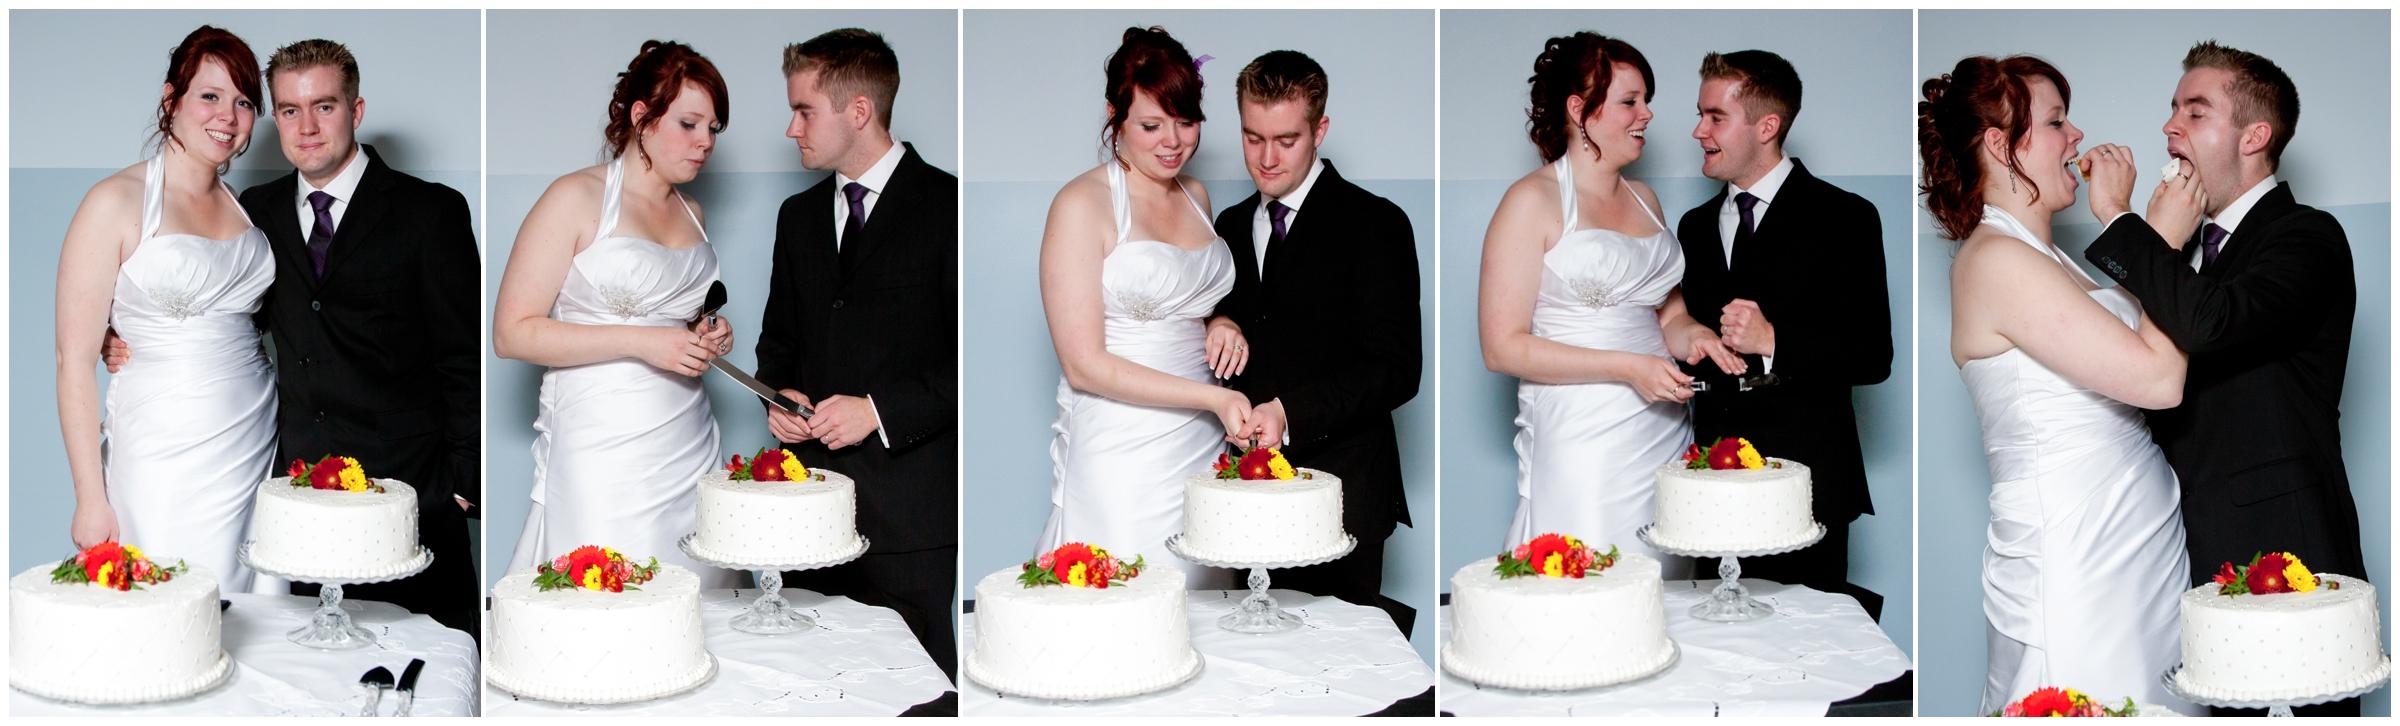 Bree and Tyler Wedding_0036.jpg